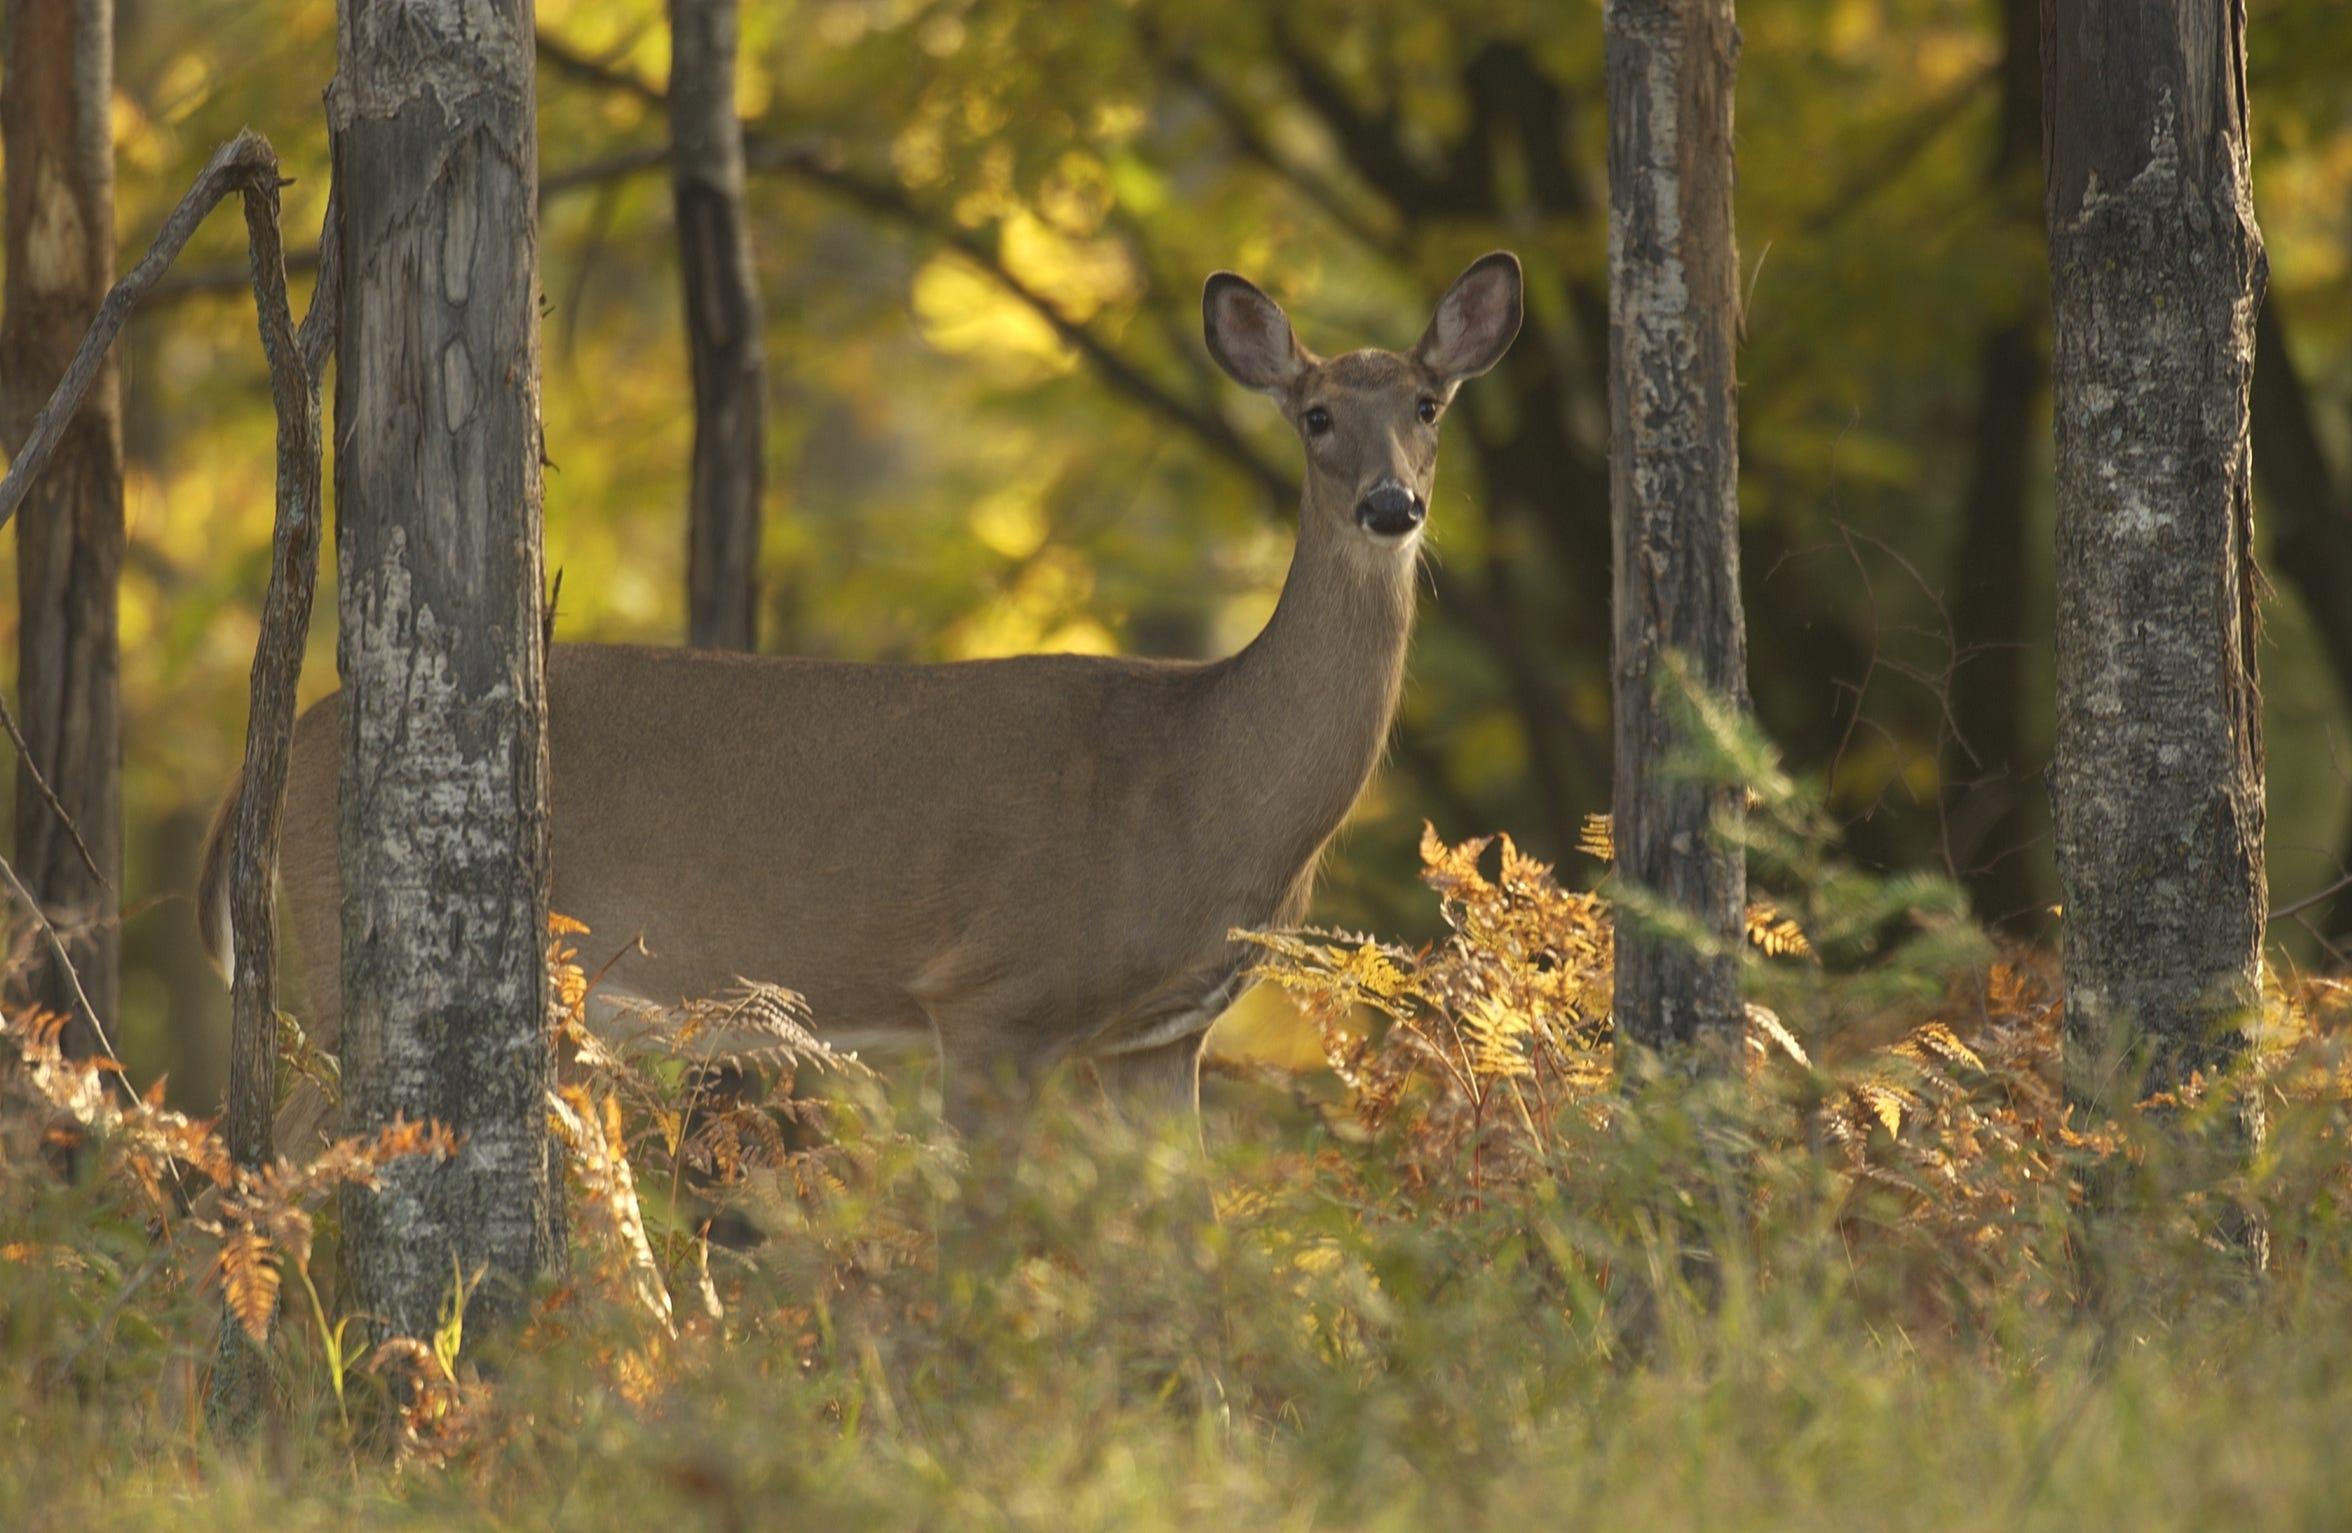 Opening Day of firearms deer season is Thursday.